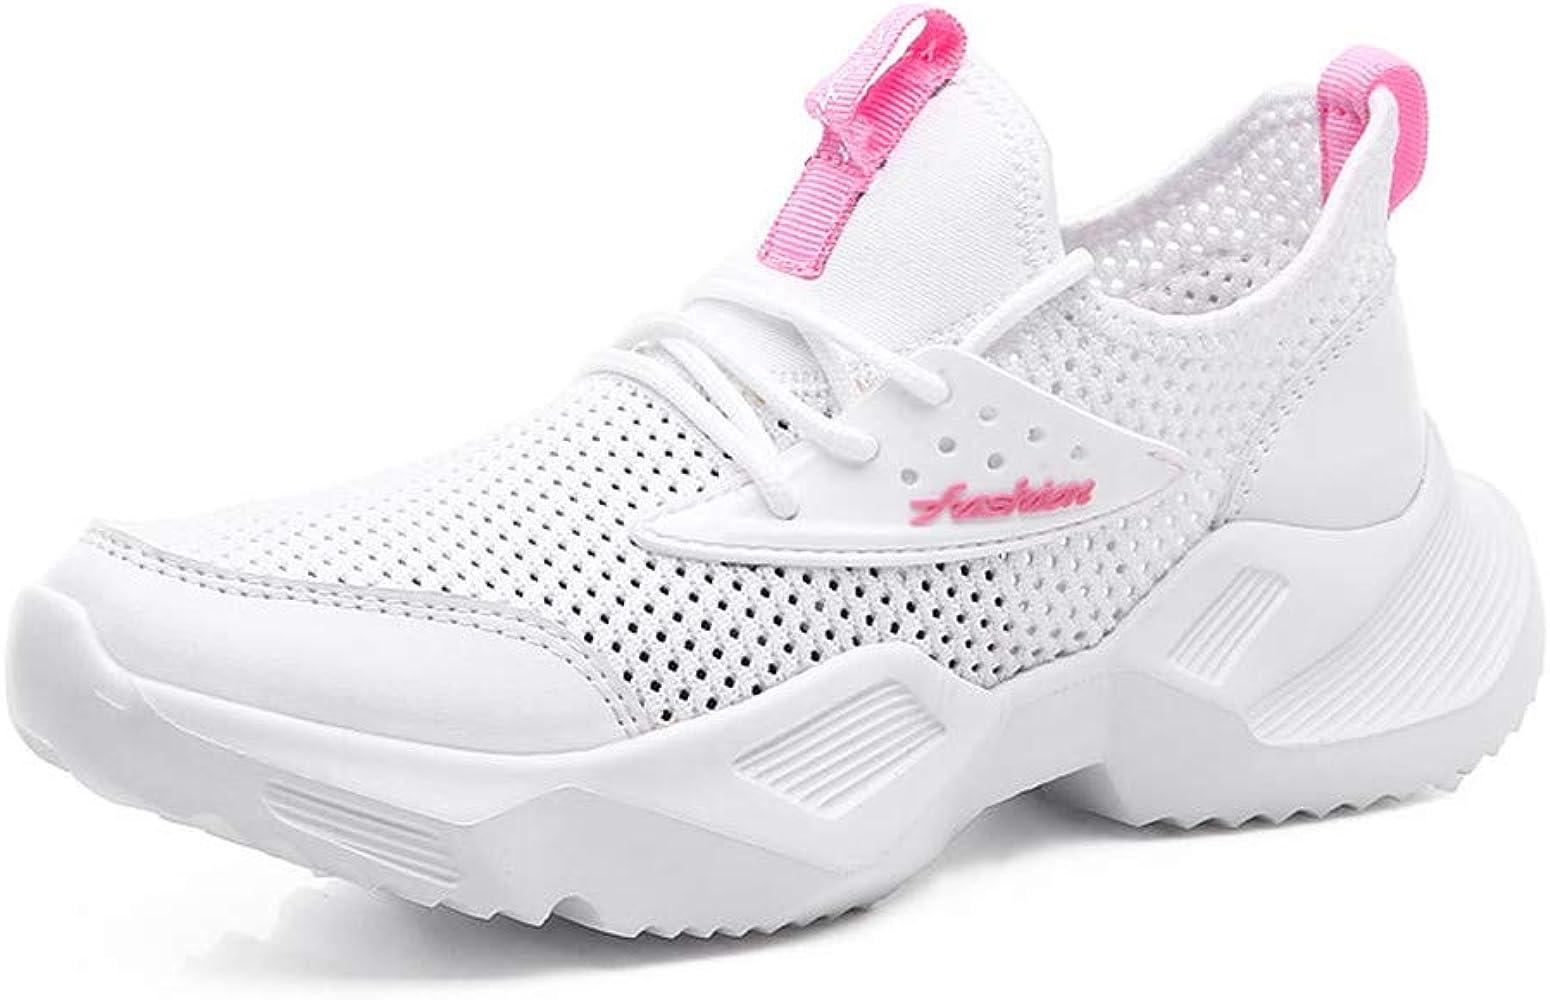 ZARLLE Zapatillas De Deporte Zapatos Respirado Ligero Moda Malla Mujeres Deporte Running Zapatillas Sacudir Casual Zapatos Height-Increasing Sneaker: Amazon.es: Ropa y accesorios